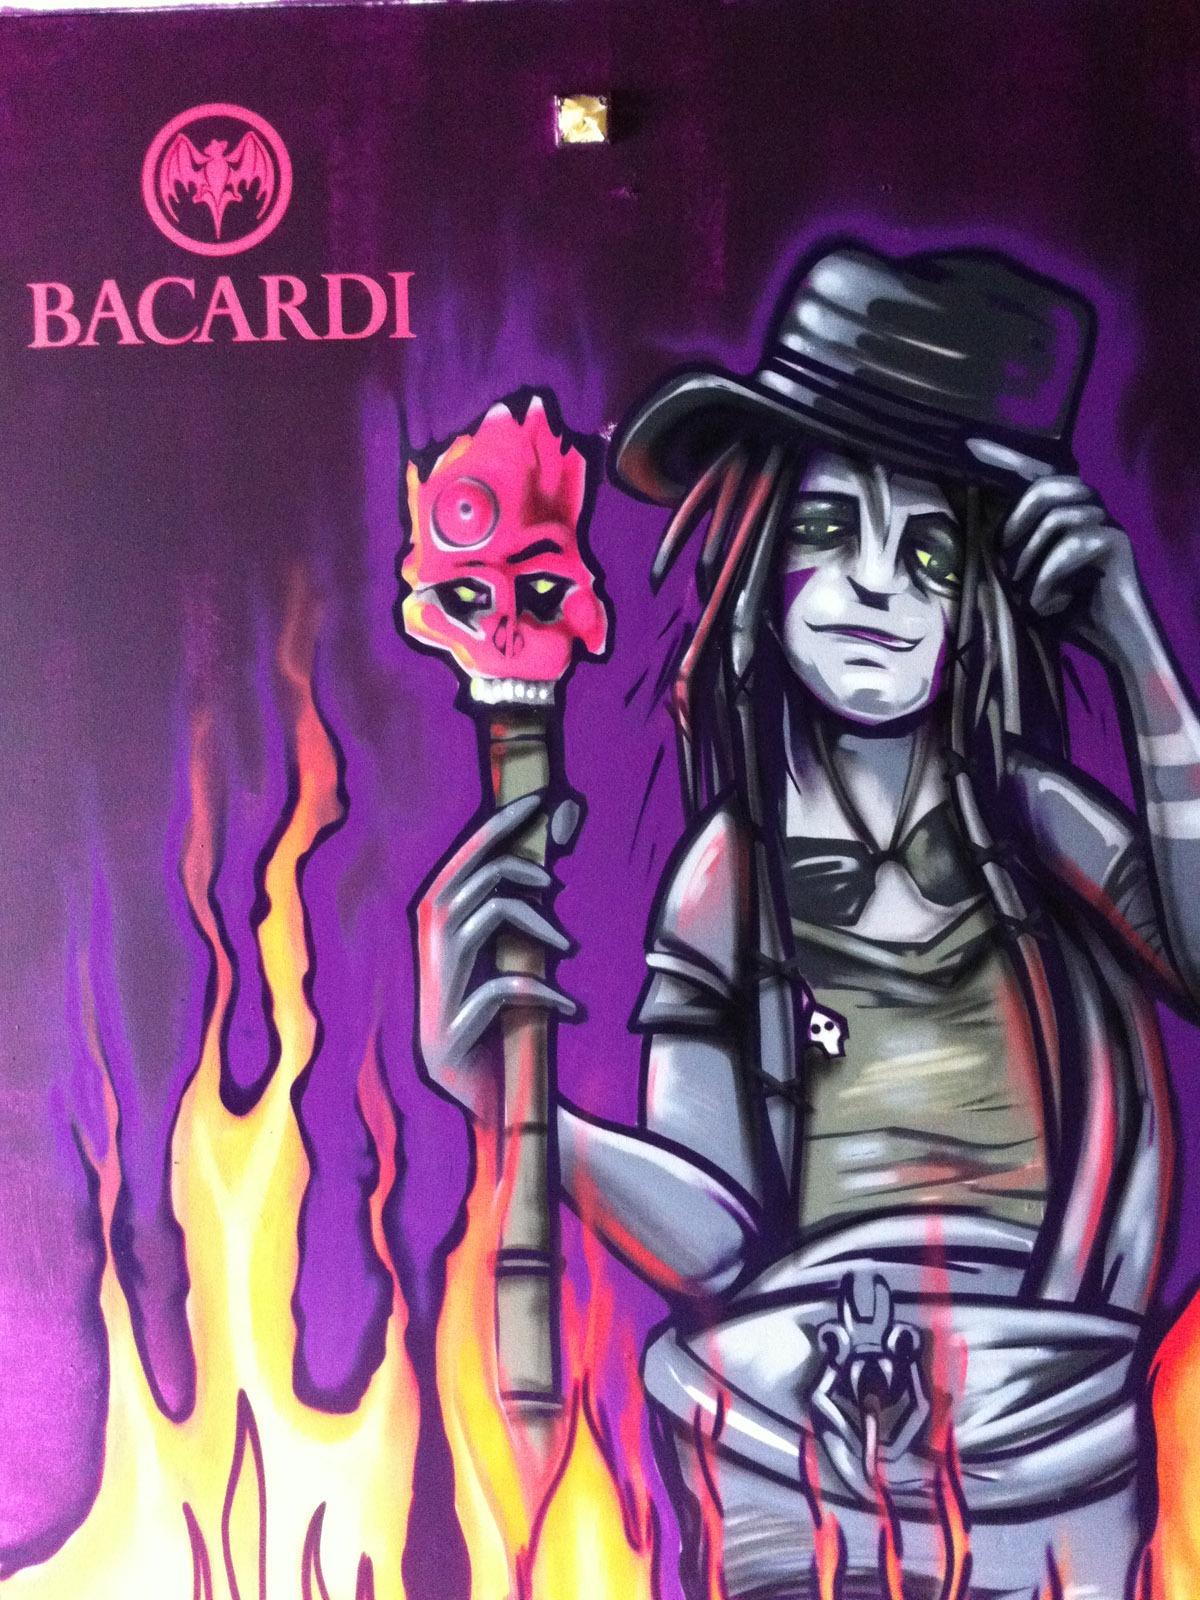 graffitiauftrag-graffitikuenstler-artmos4-voodoo-disco-fassadengestaltung-illustration-neon